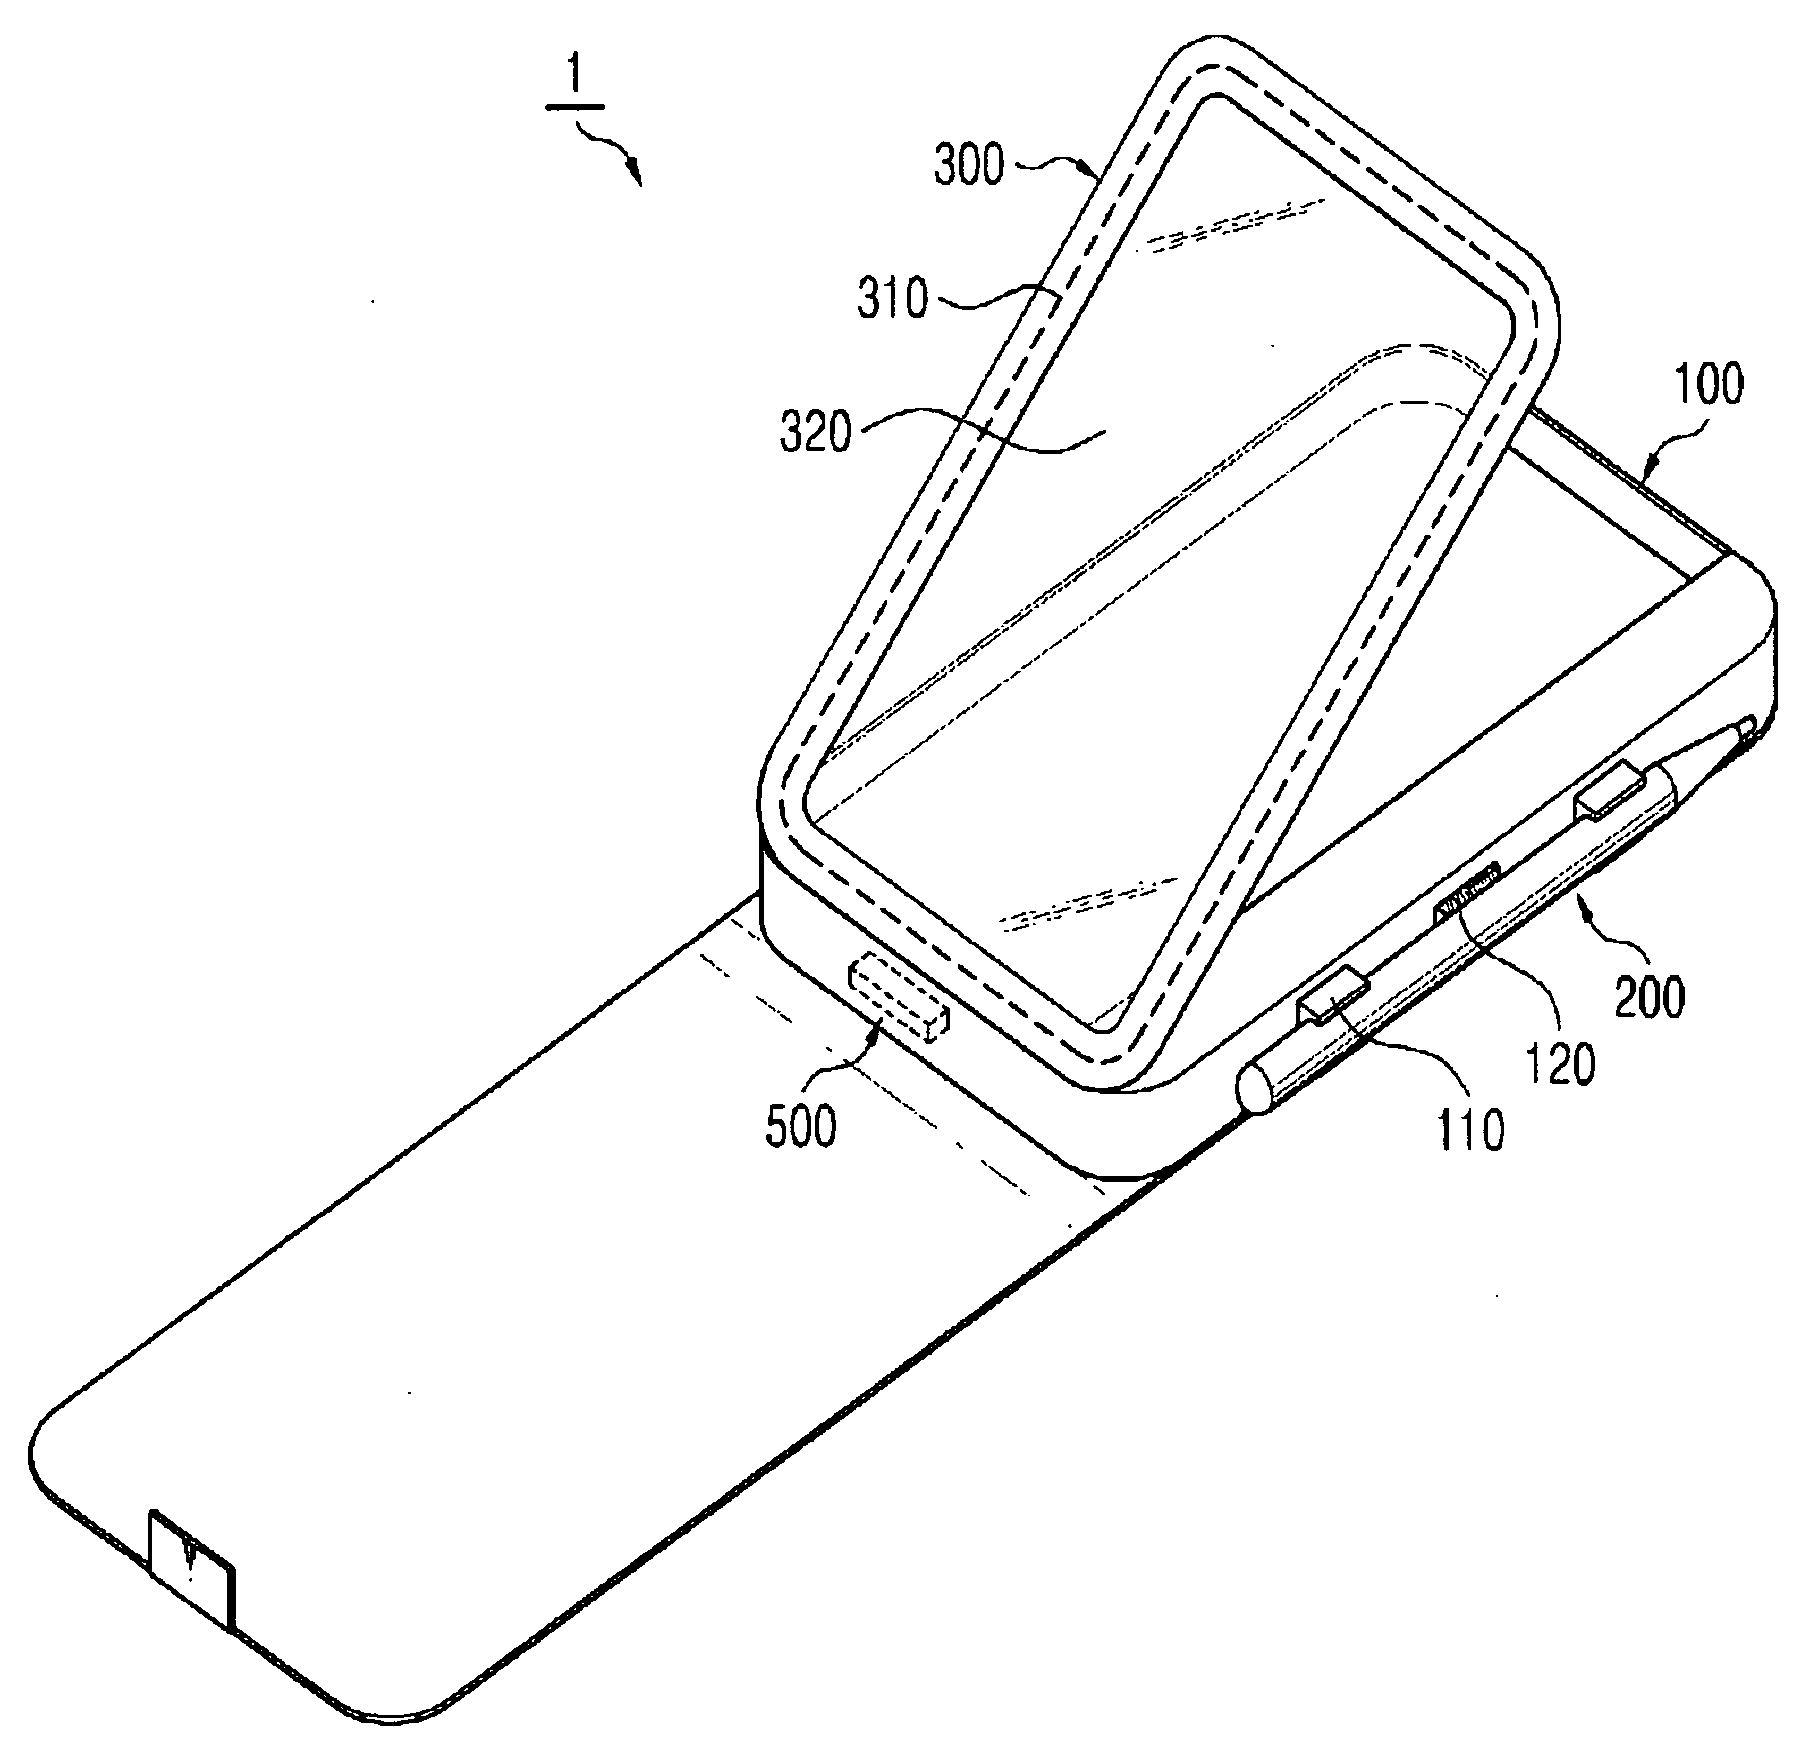 patent wo2011159090a2